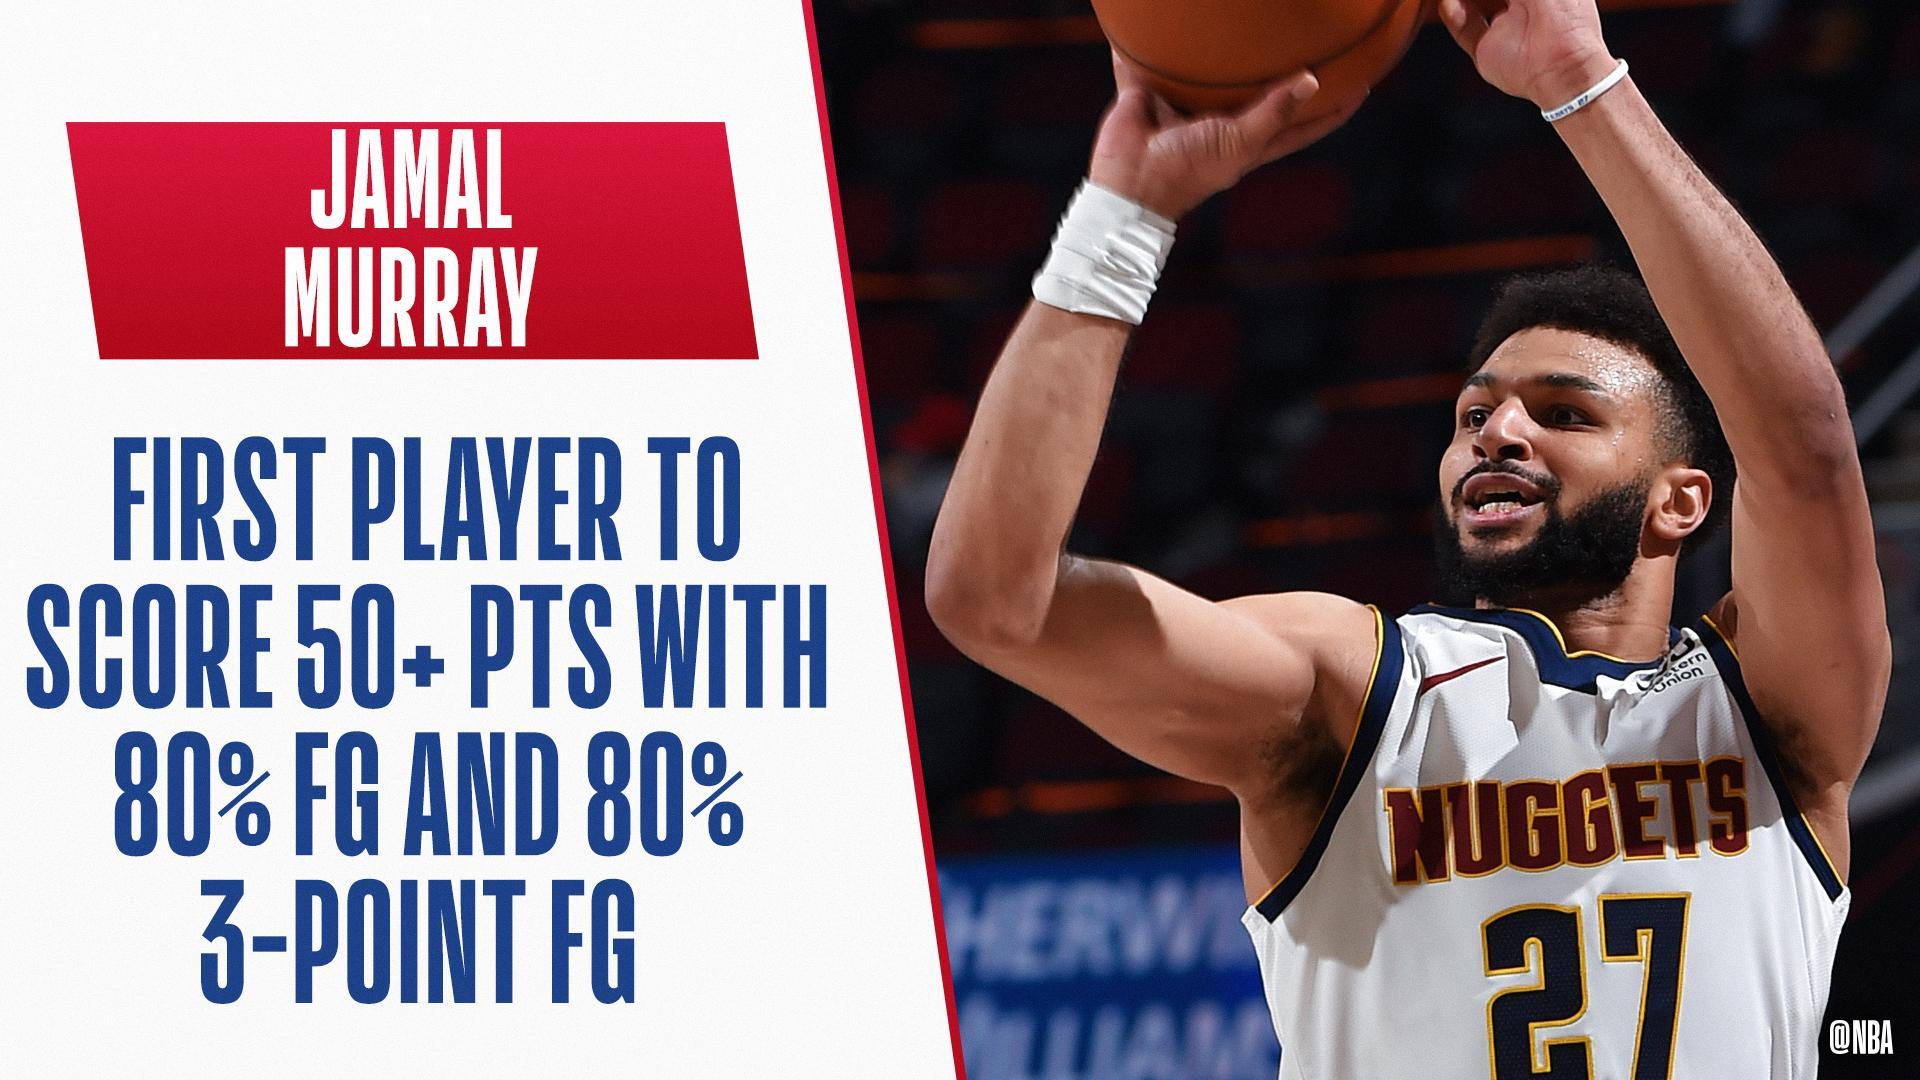 Jamal Murray records historic 50-point performance